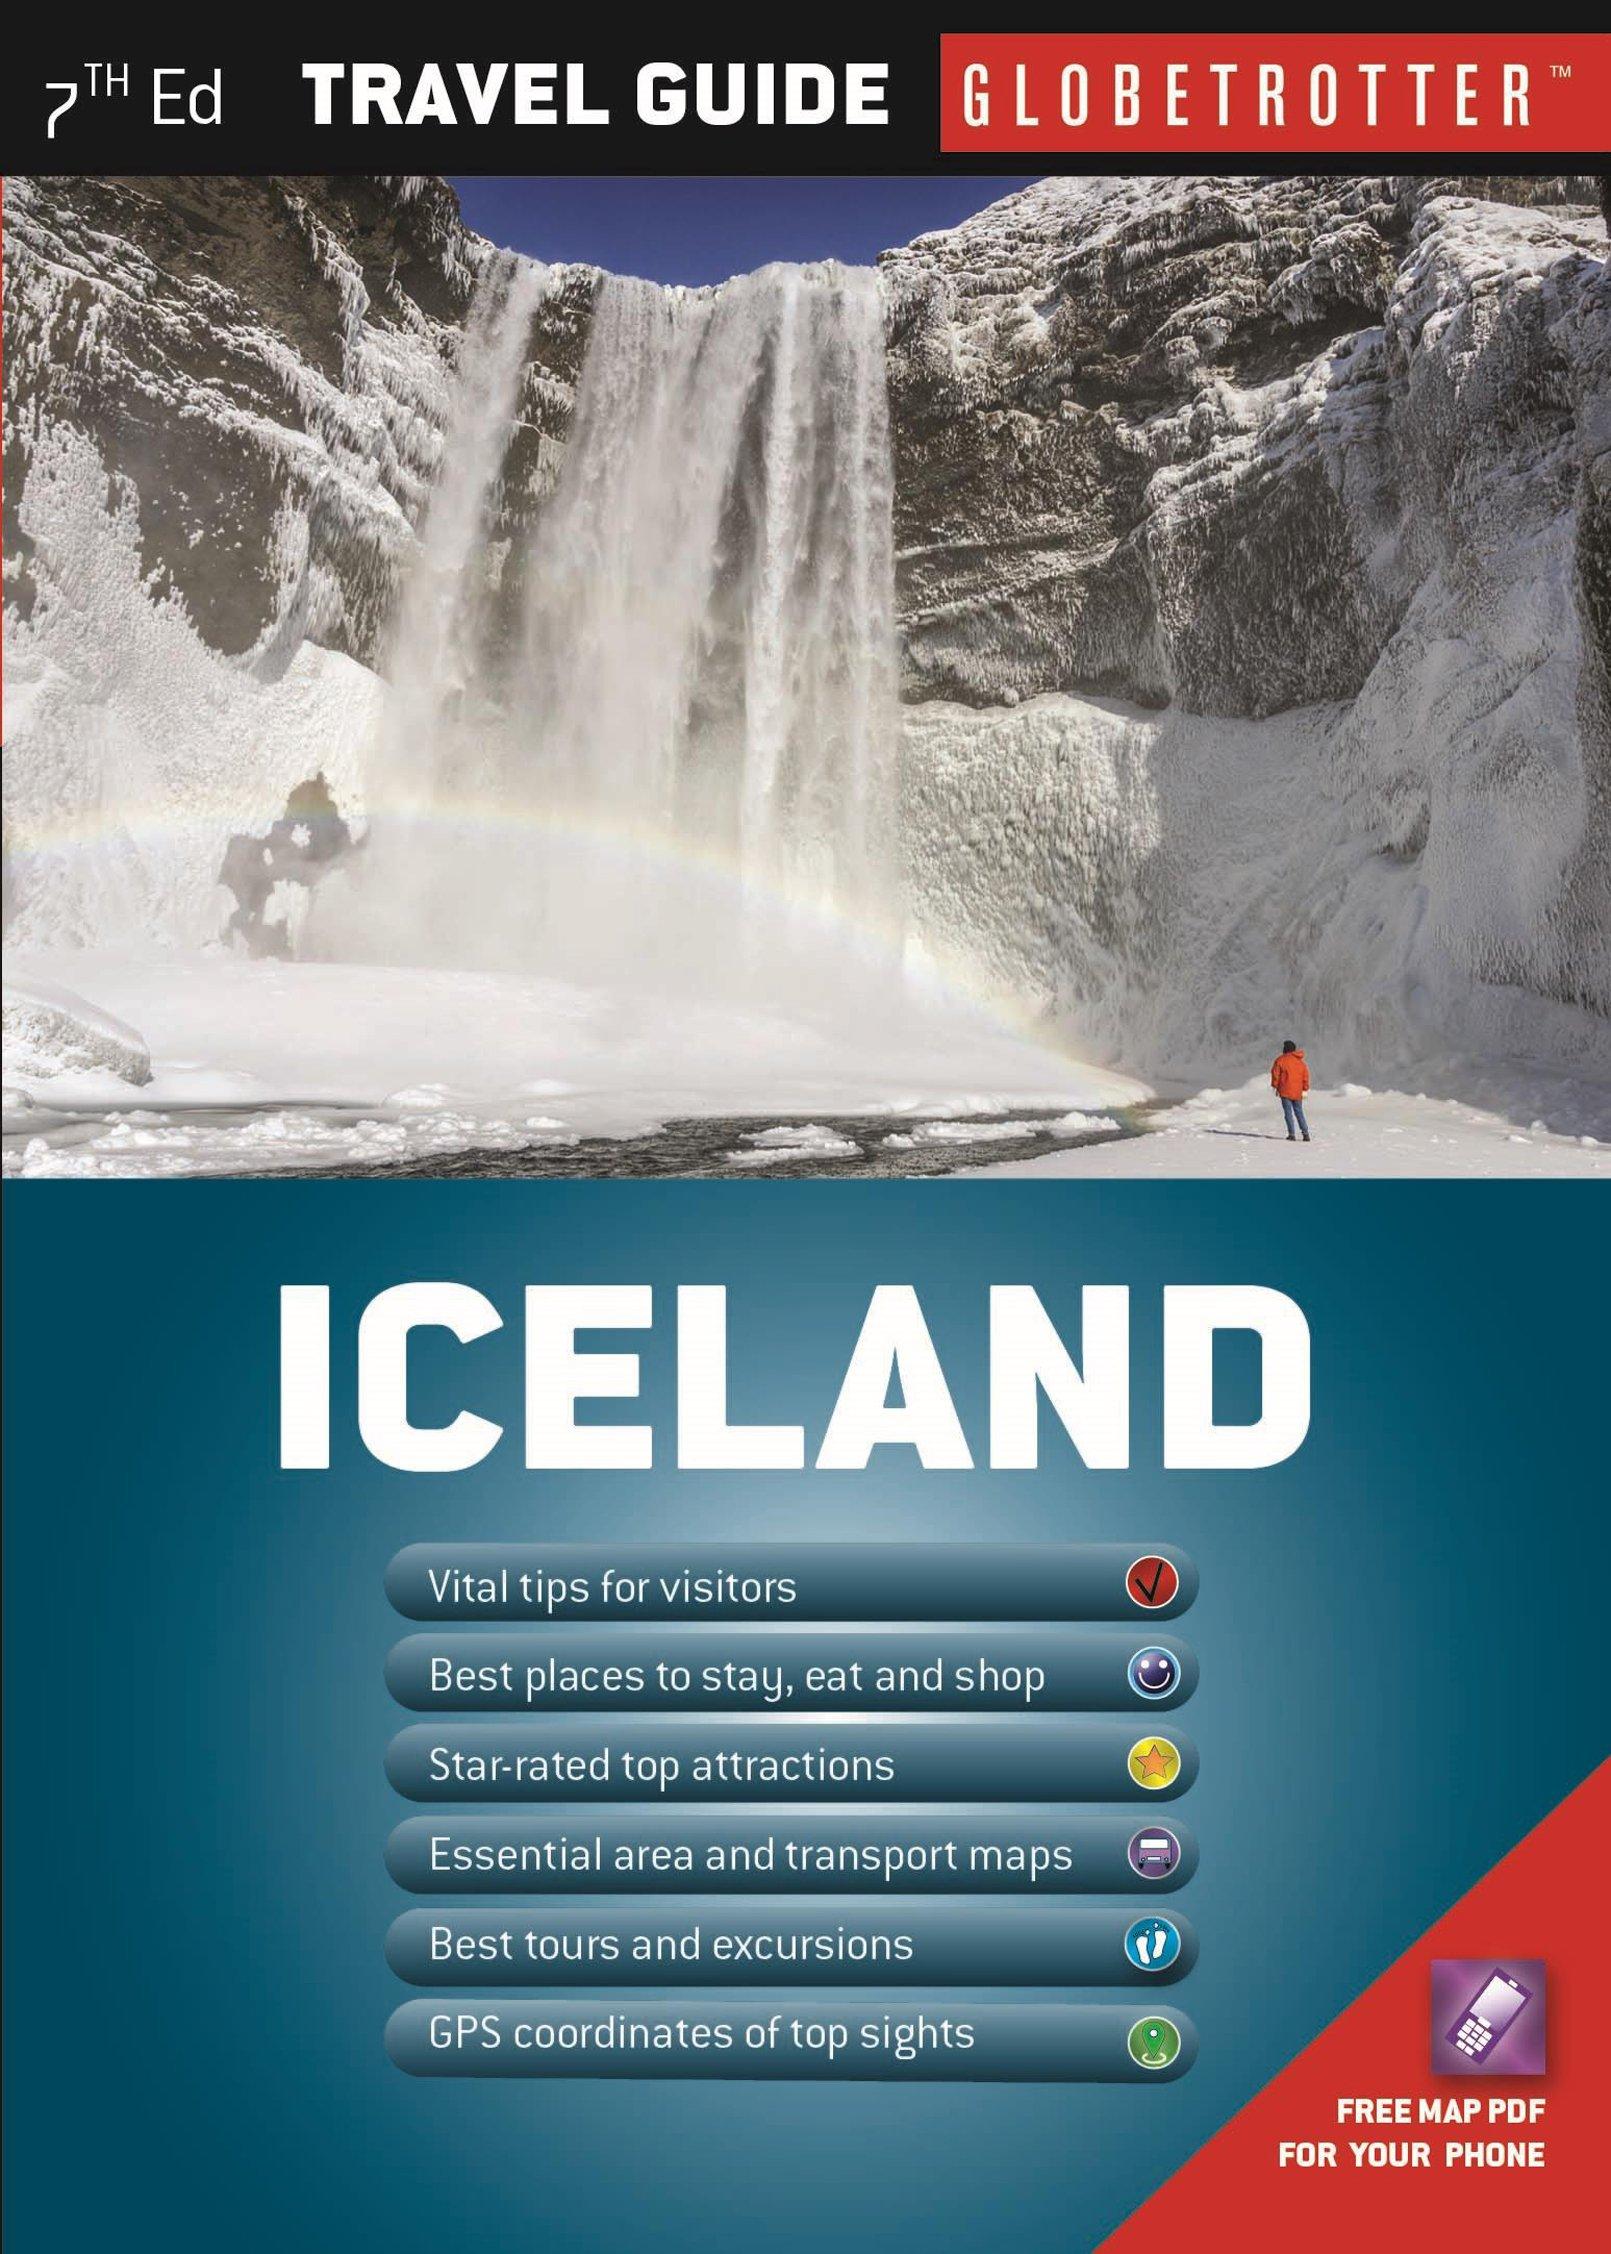 Iceland Travel Pack (Globetrotter Travel Guide)